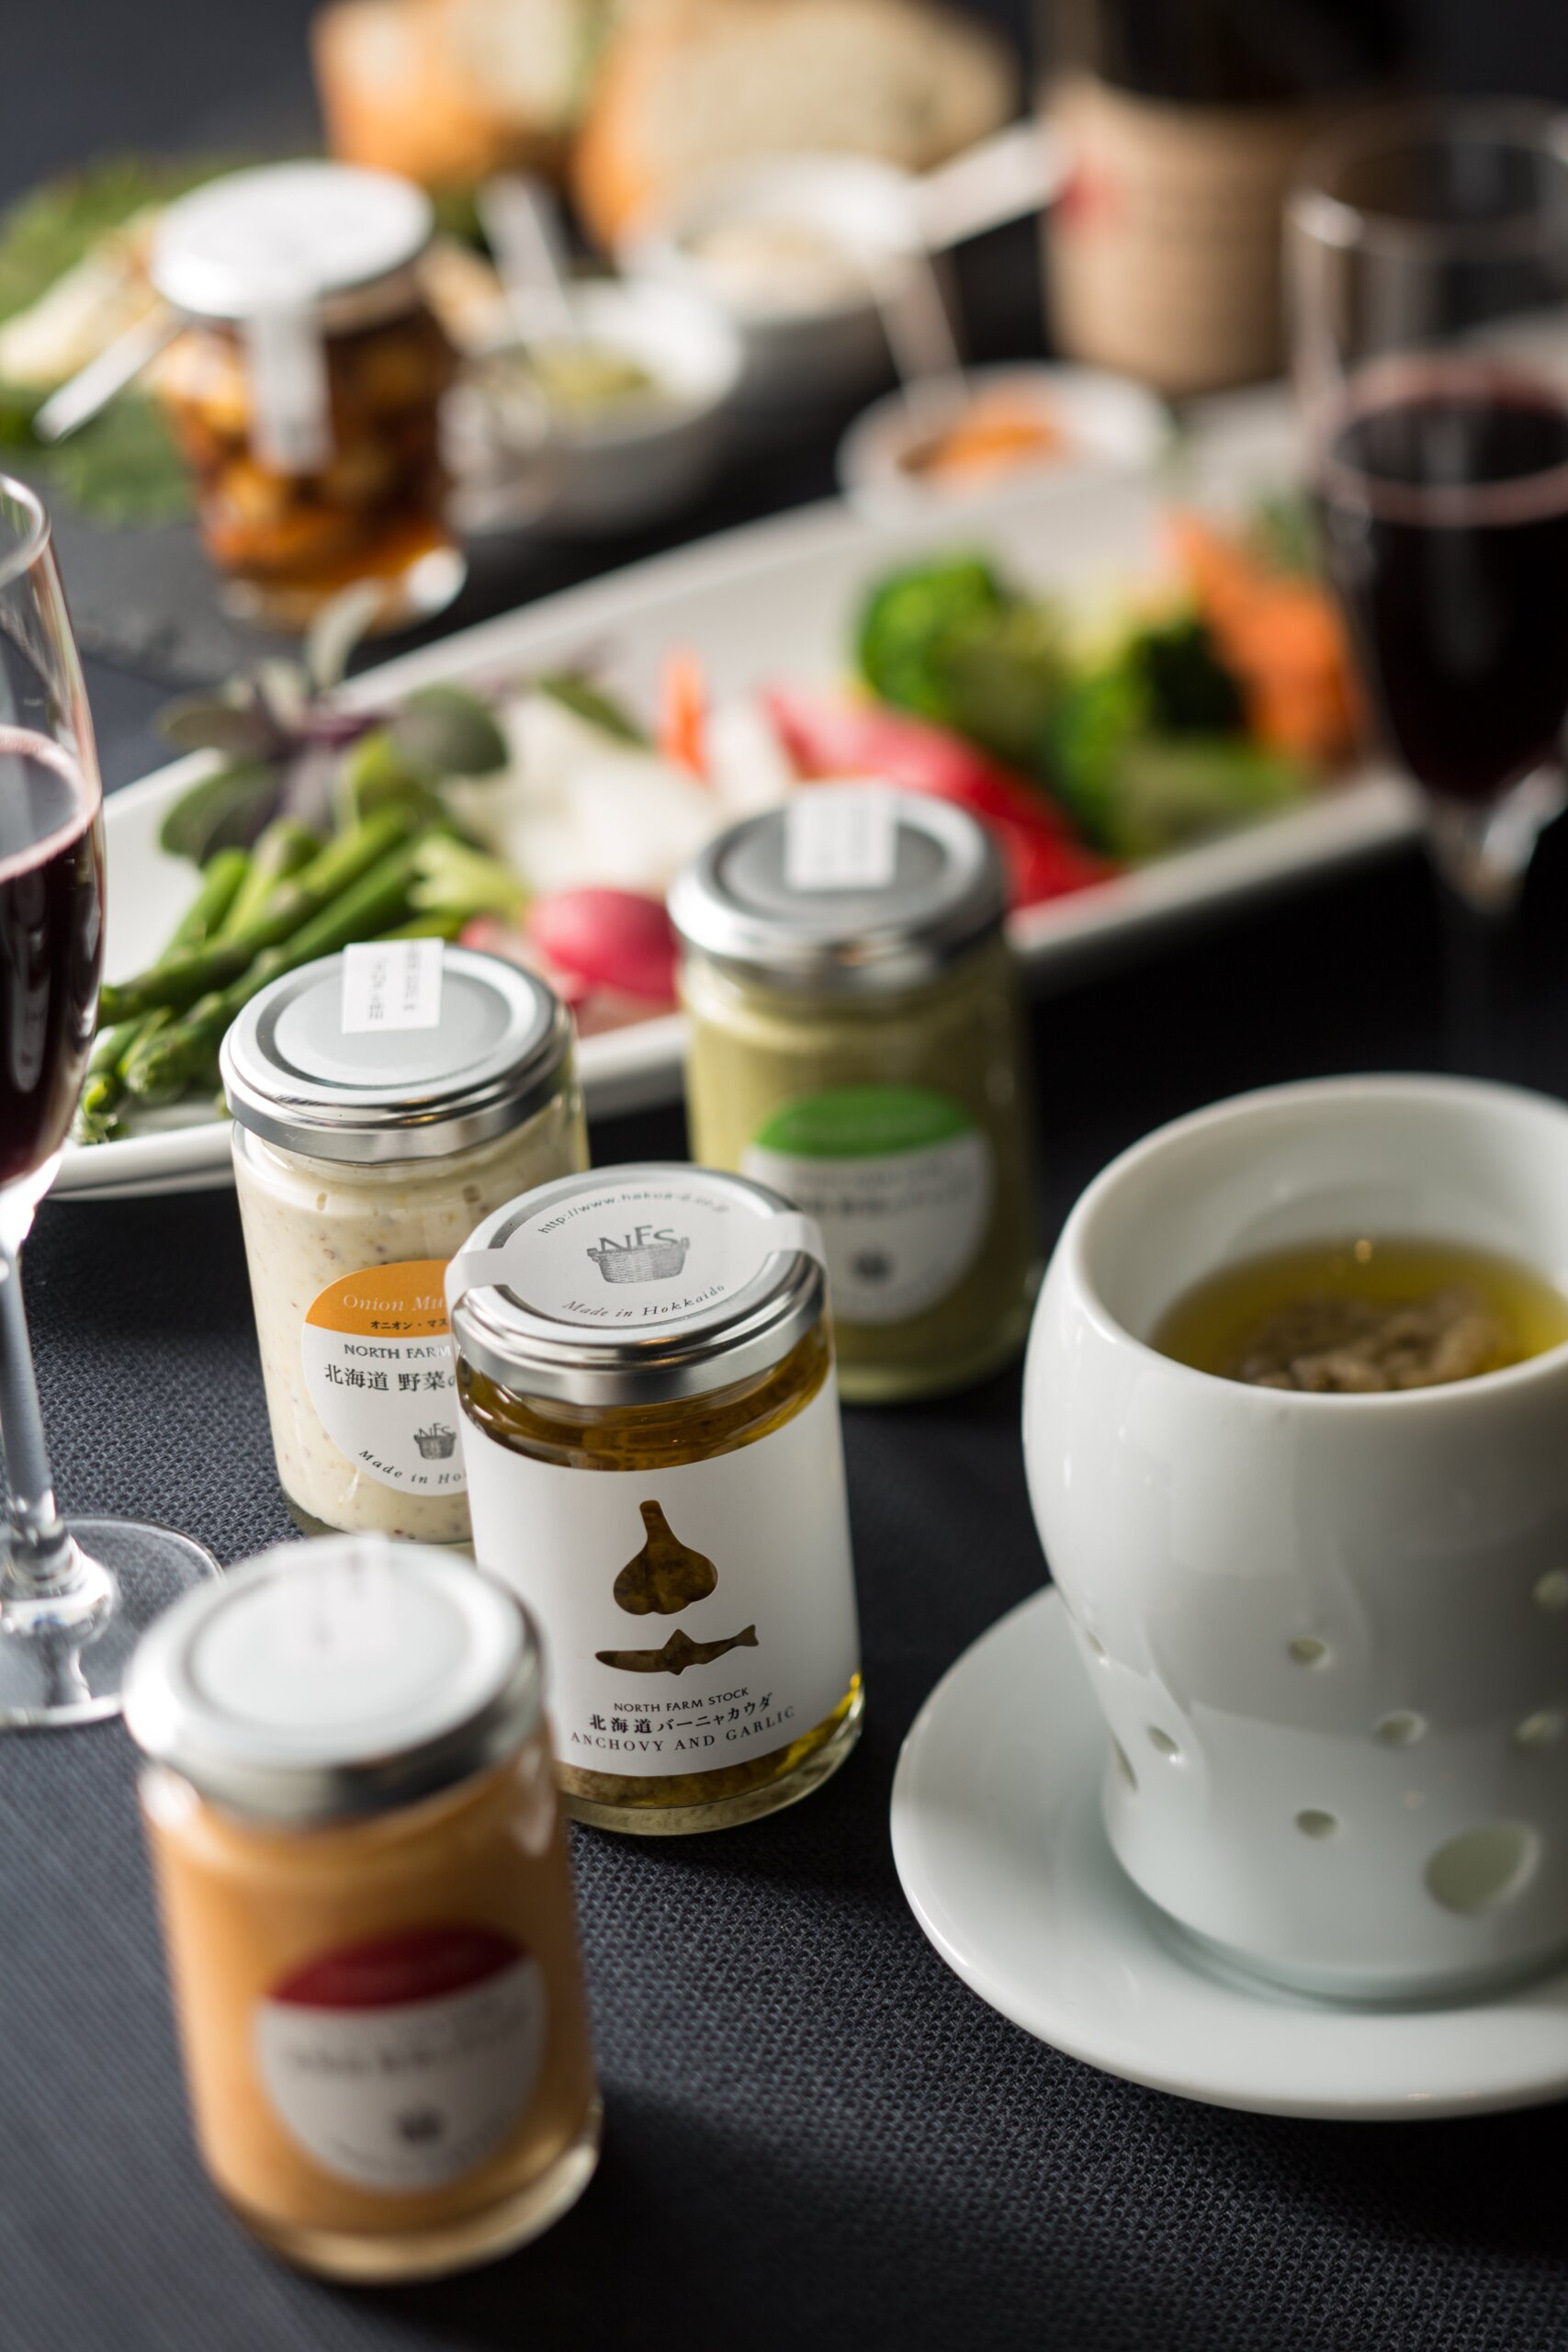 NORTH FARM STOCK SHOP & CAFÉ:保存北海道食材純淨美味的加工食品